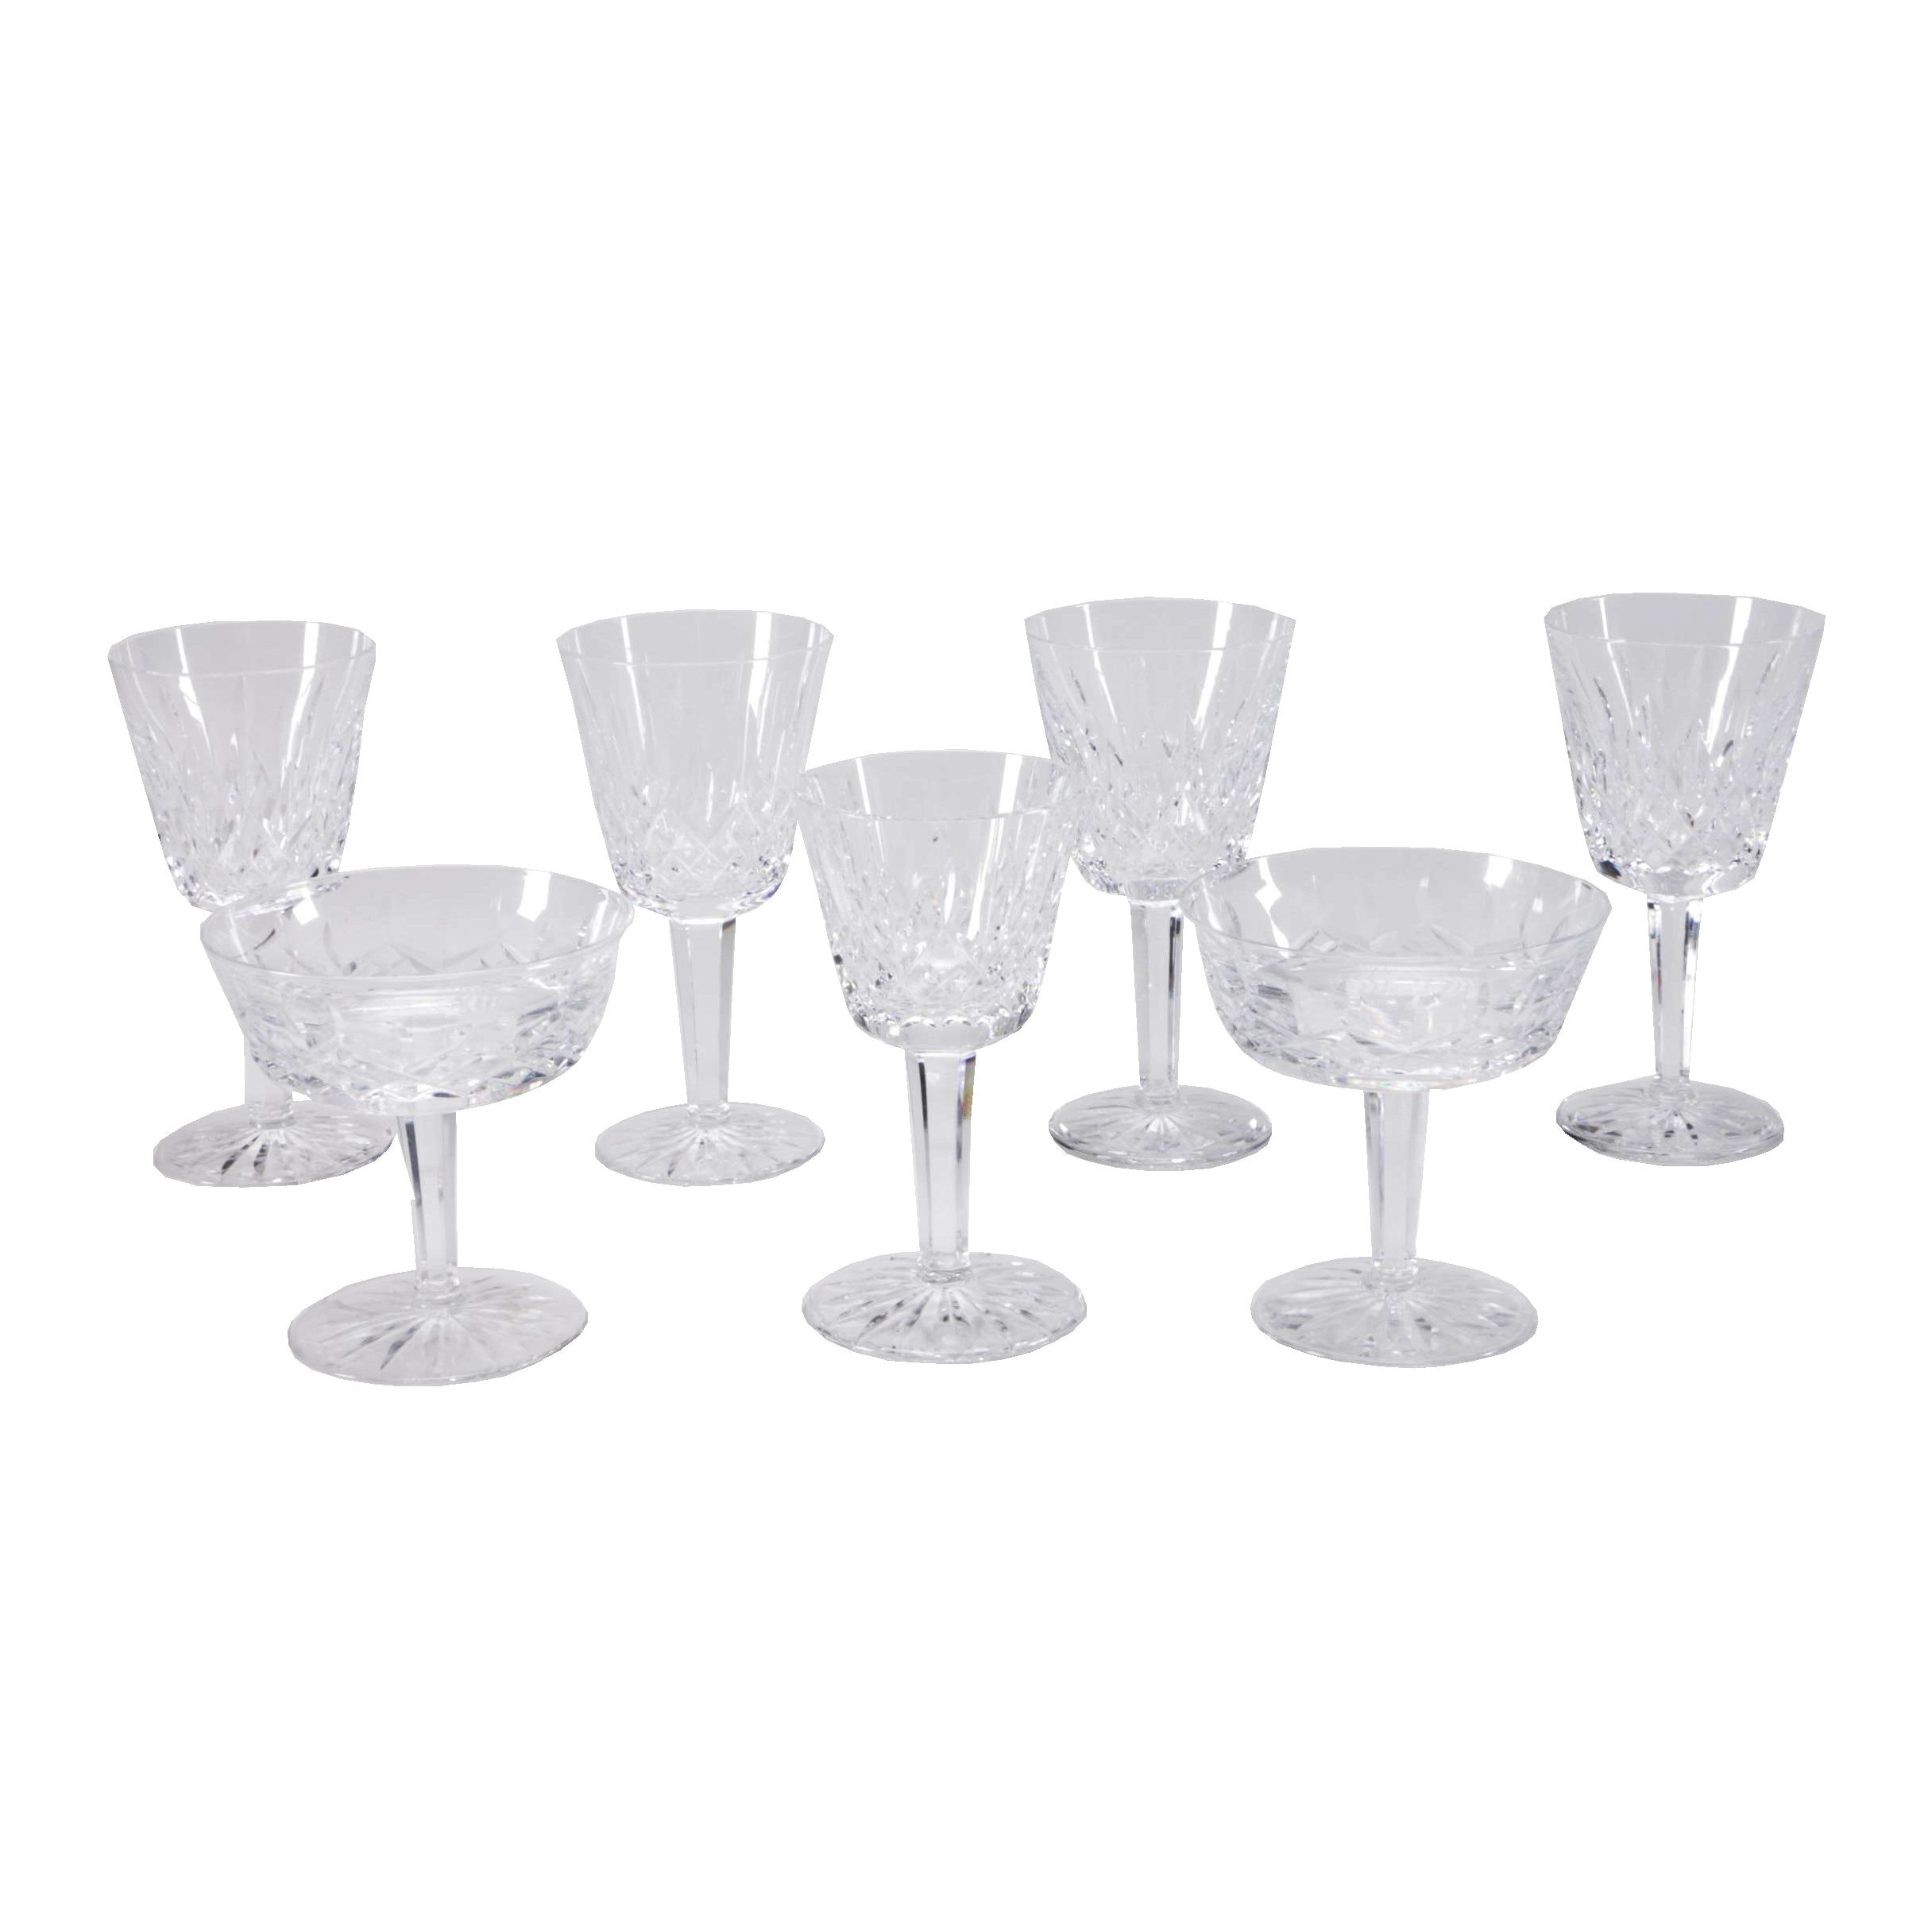 "Waterford ""Lismore"" Crystal Glasses"